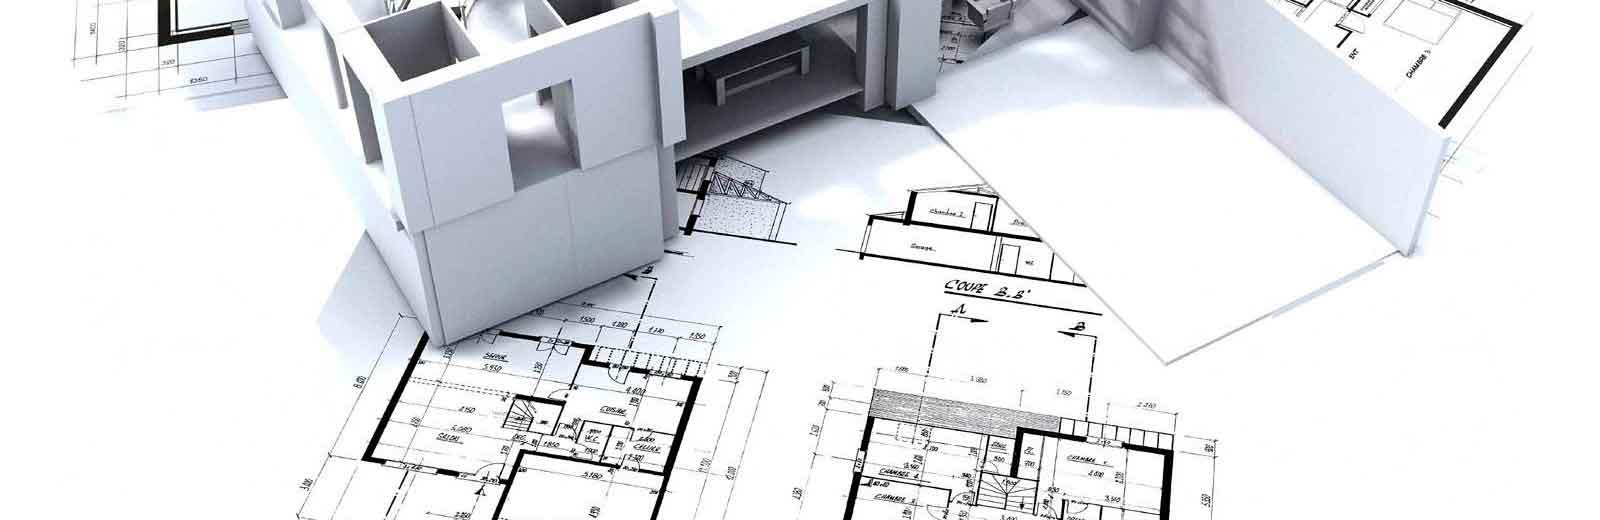 Constructor de cases passives a Girona i la Costa Brava